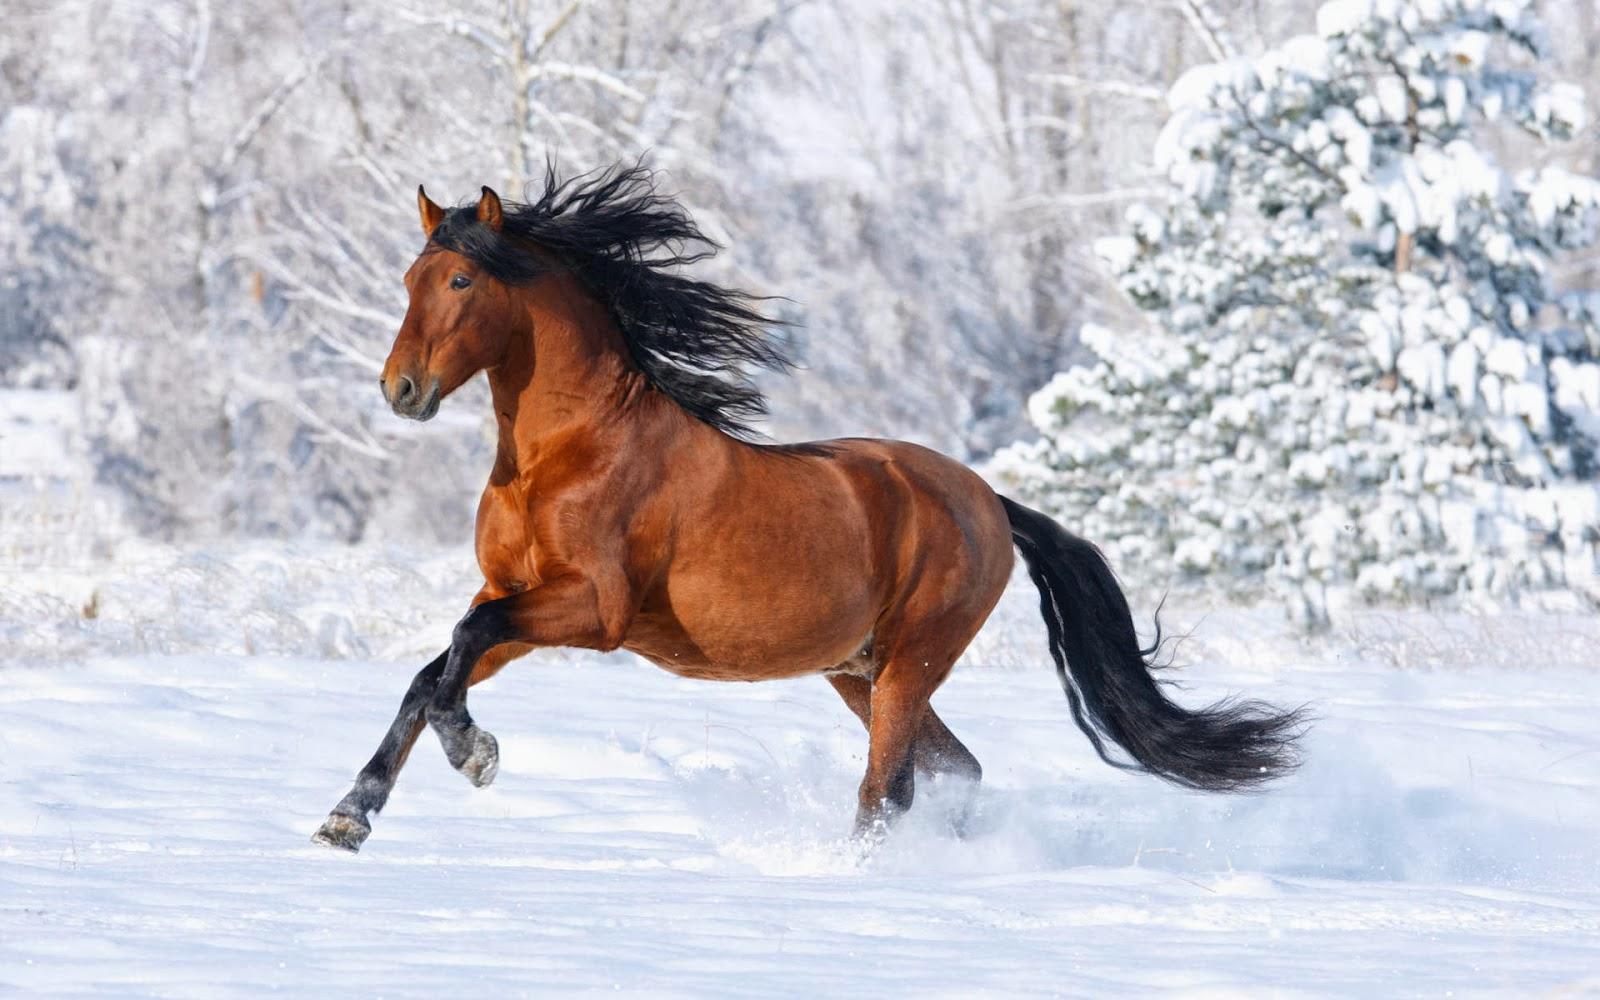 Hd wallpapers desktop horses hd wallpapers horses hd wallpapers horse thecheapjerseys Choice Image